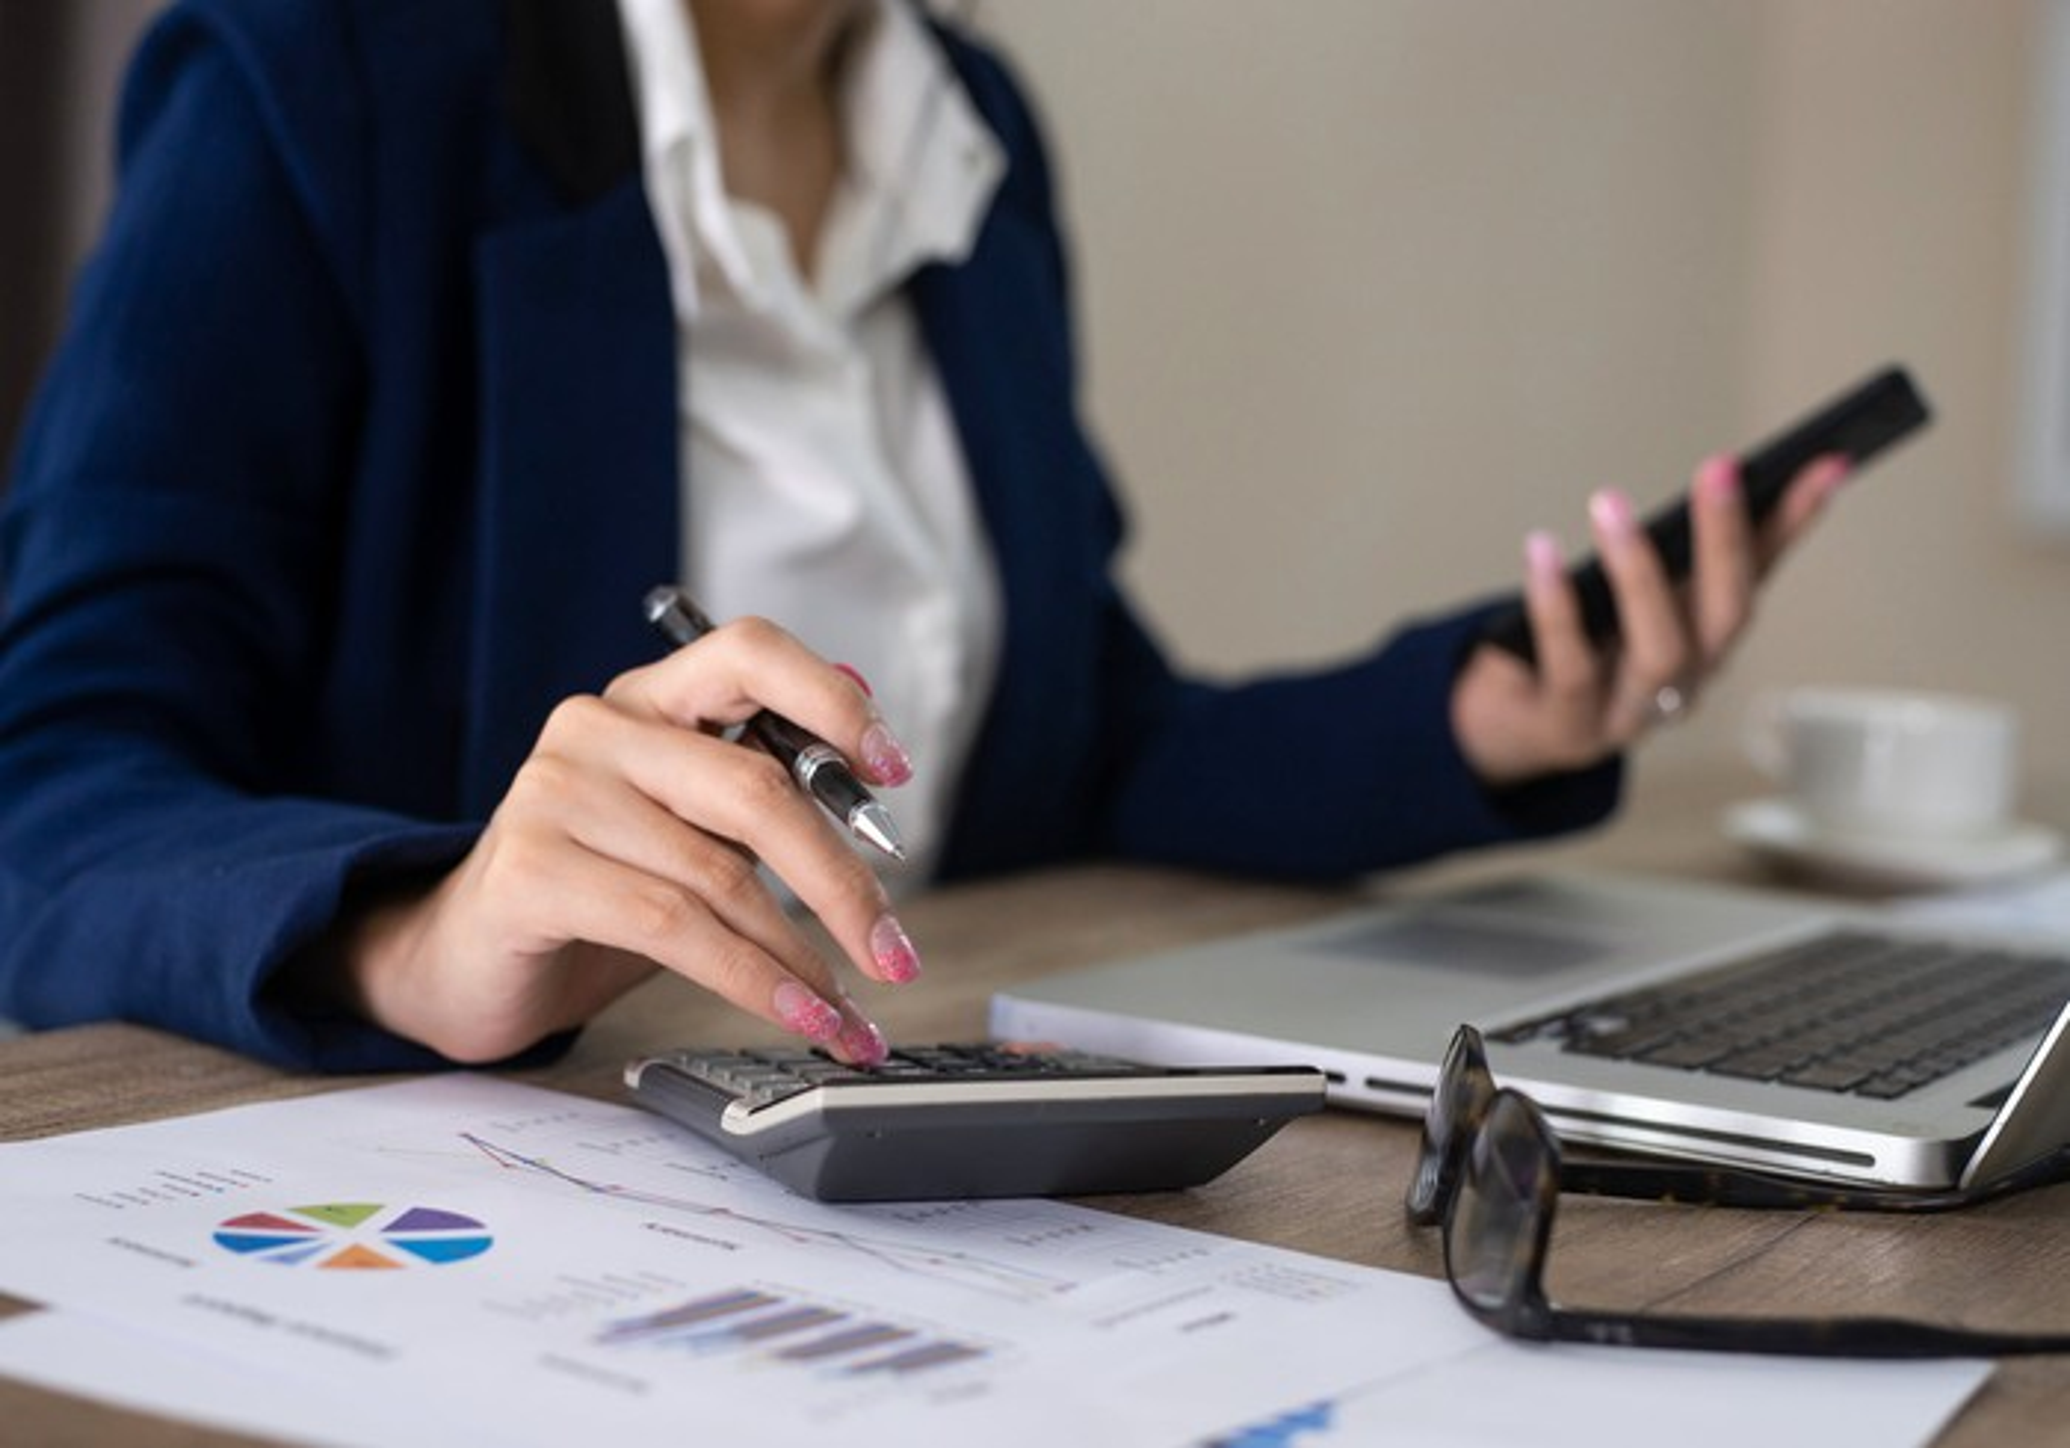 A female banker using a calculator at her desk.